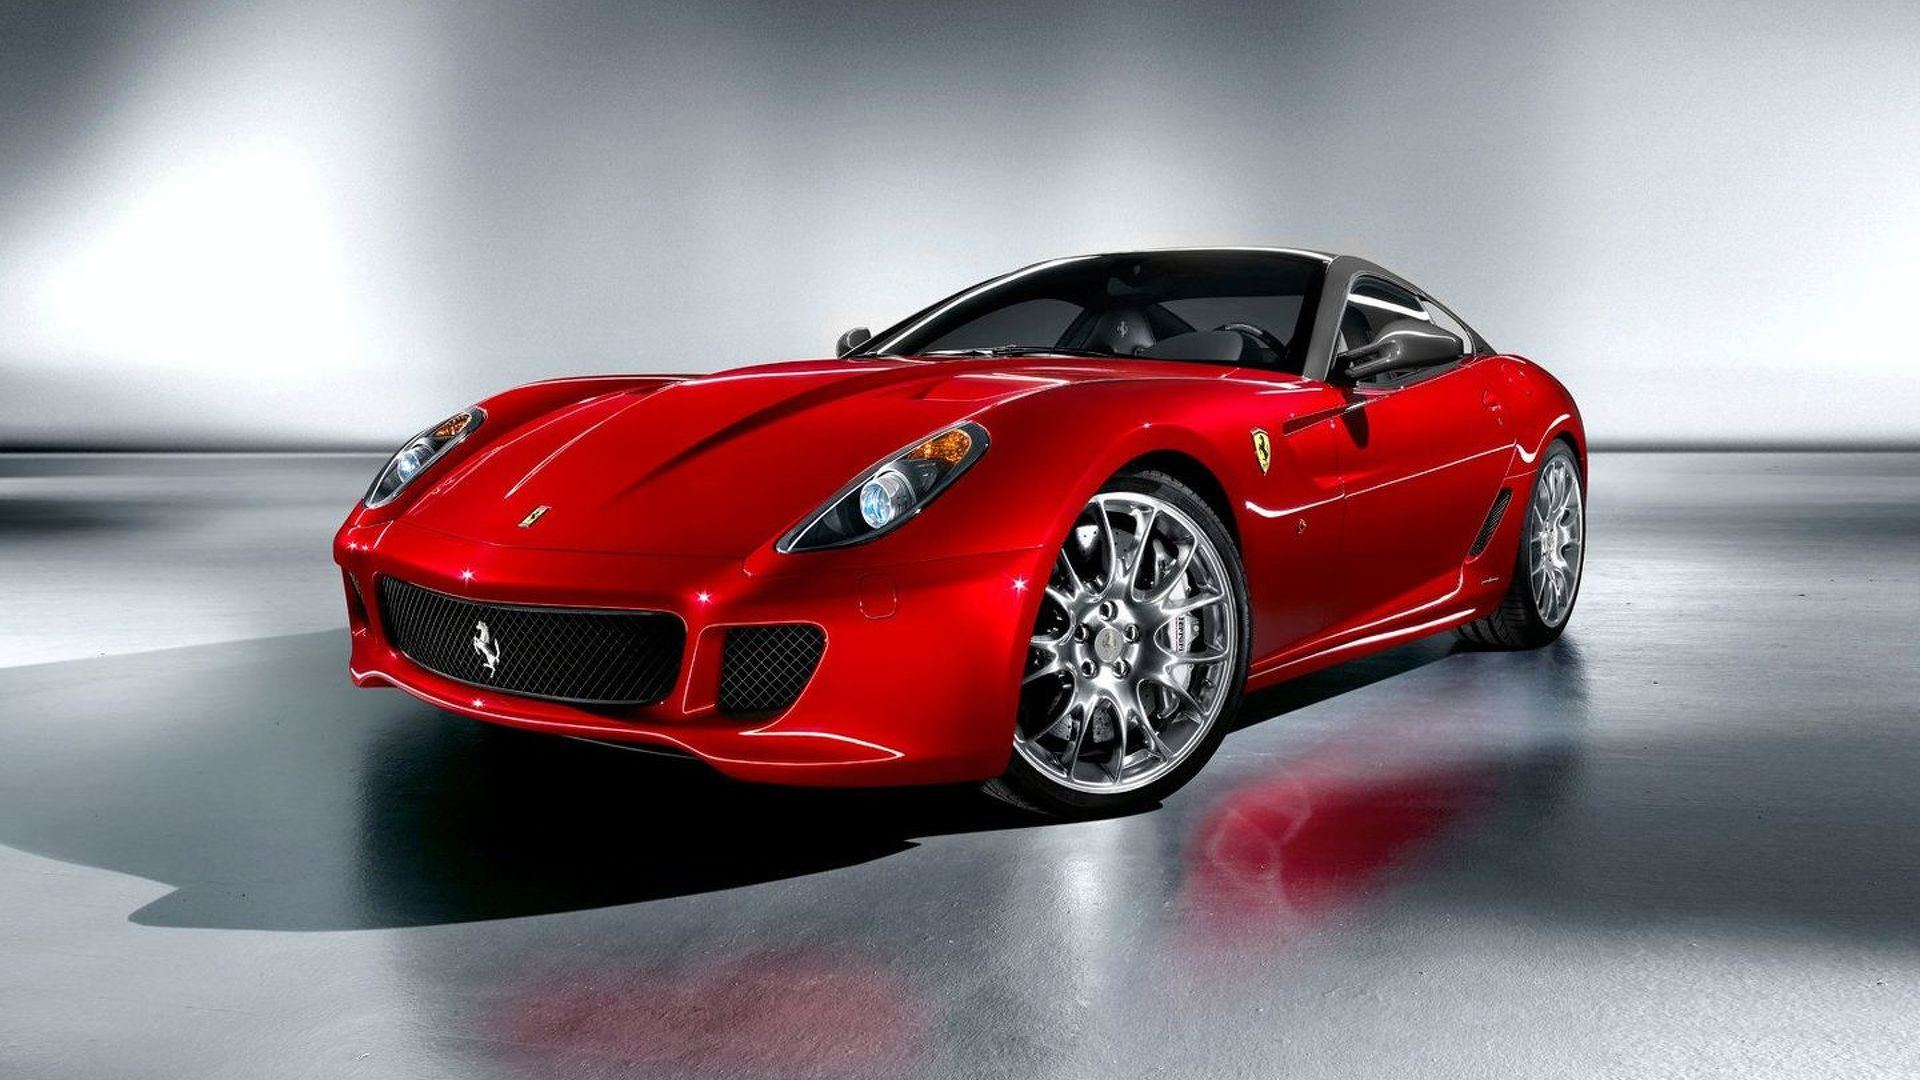 Ferrari 599 gtb fiorano hgte china limited edition announced vanachro Image collections